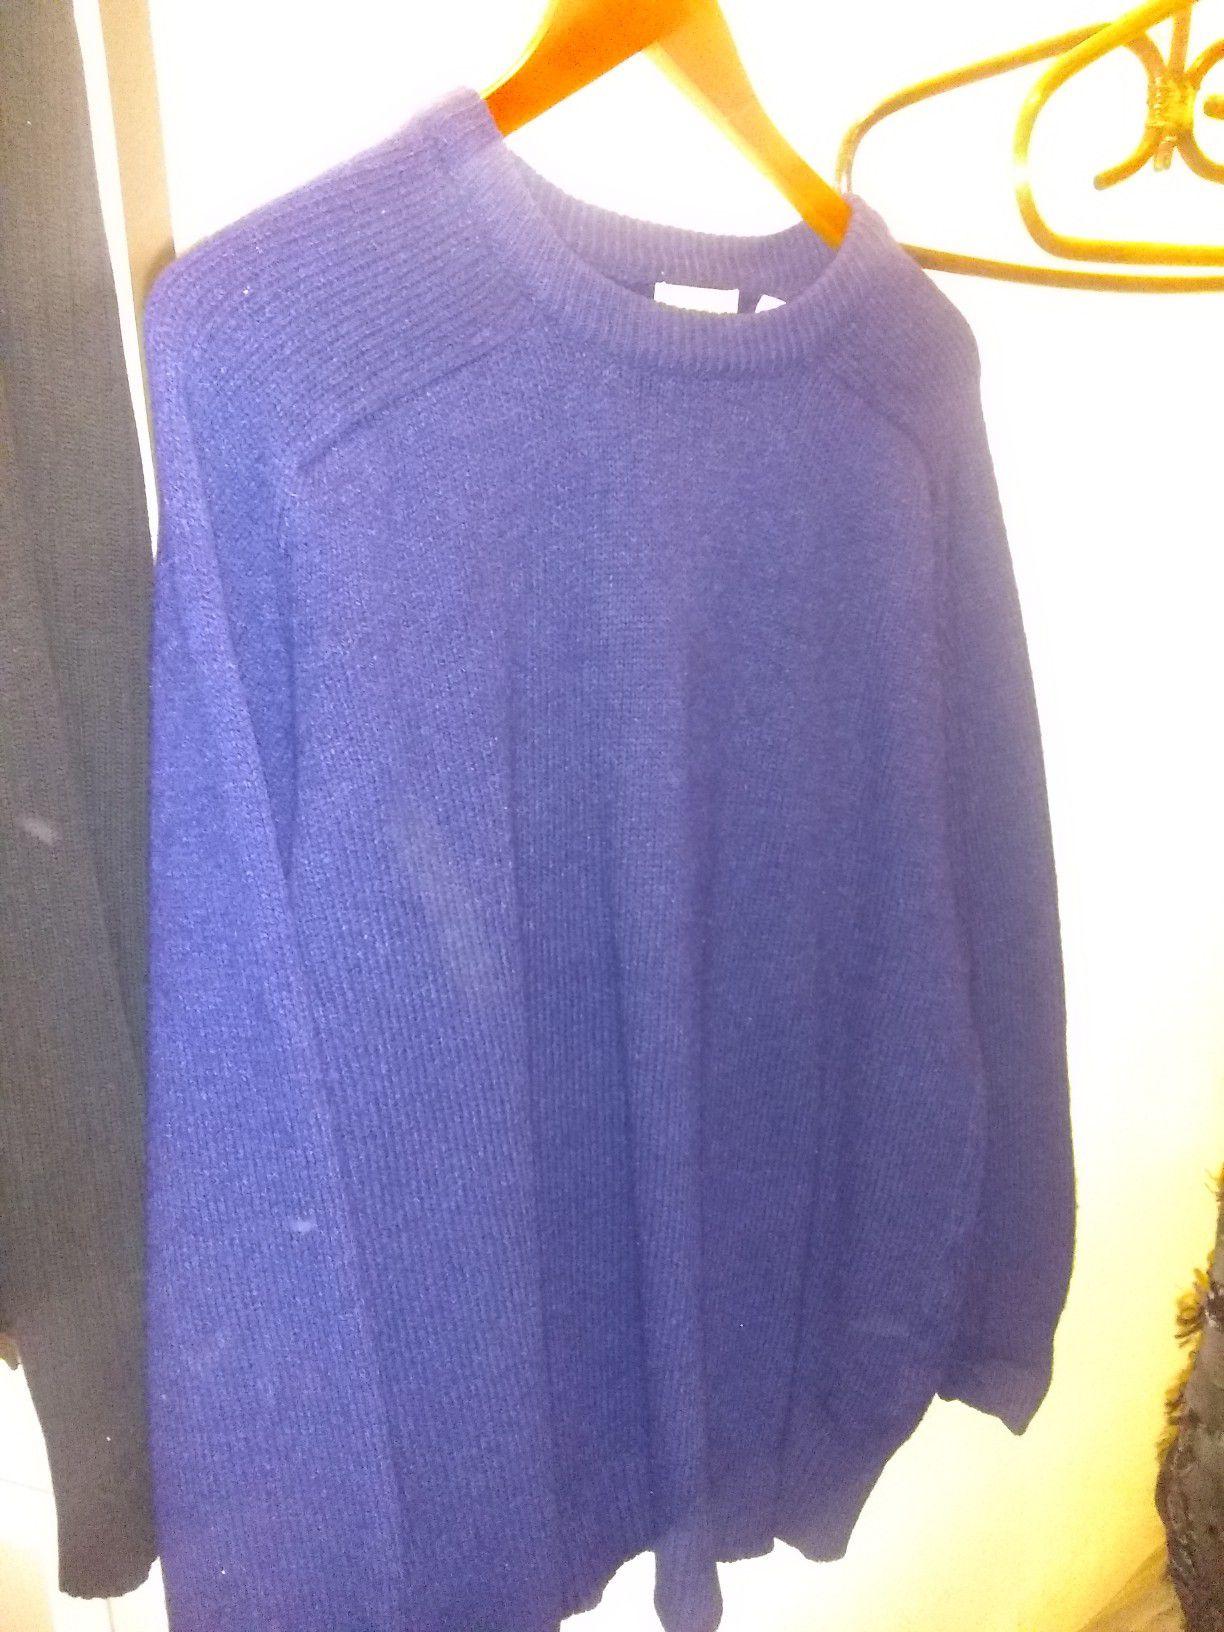 Cozy warm winter sweater